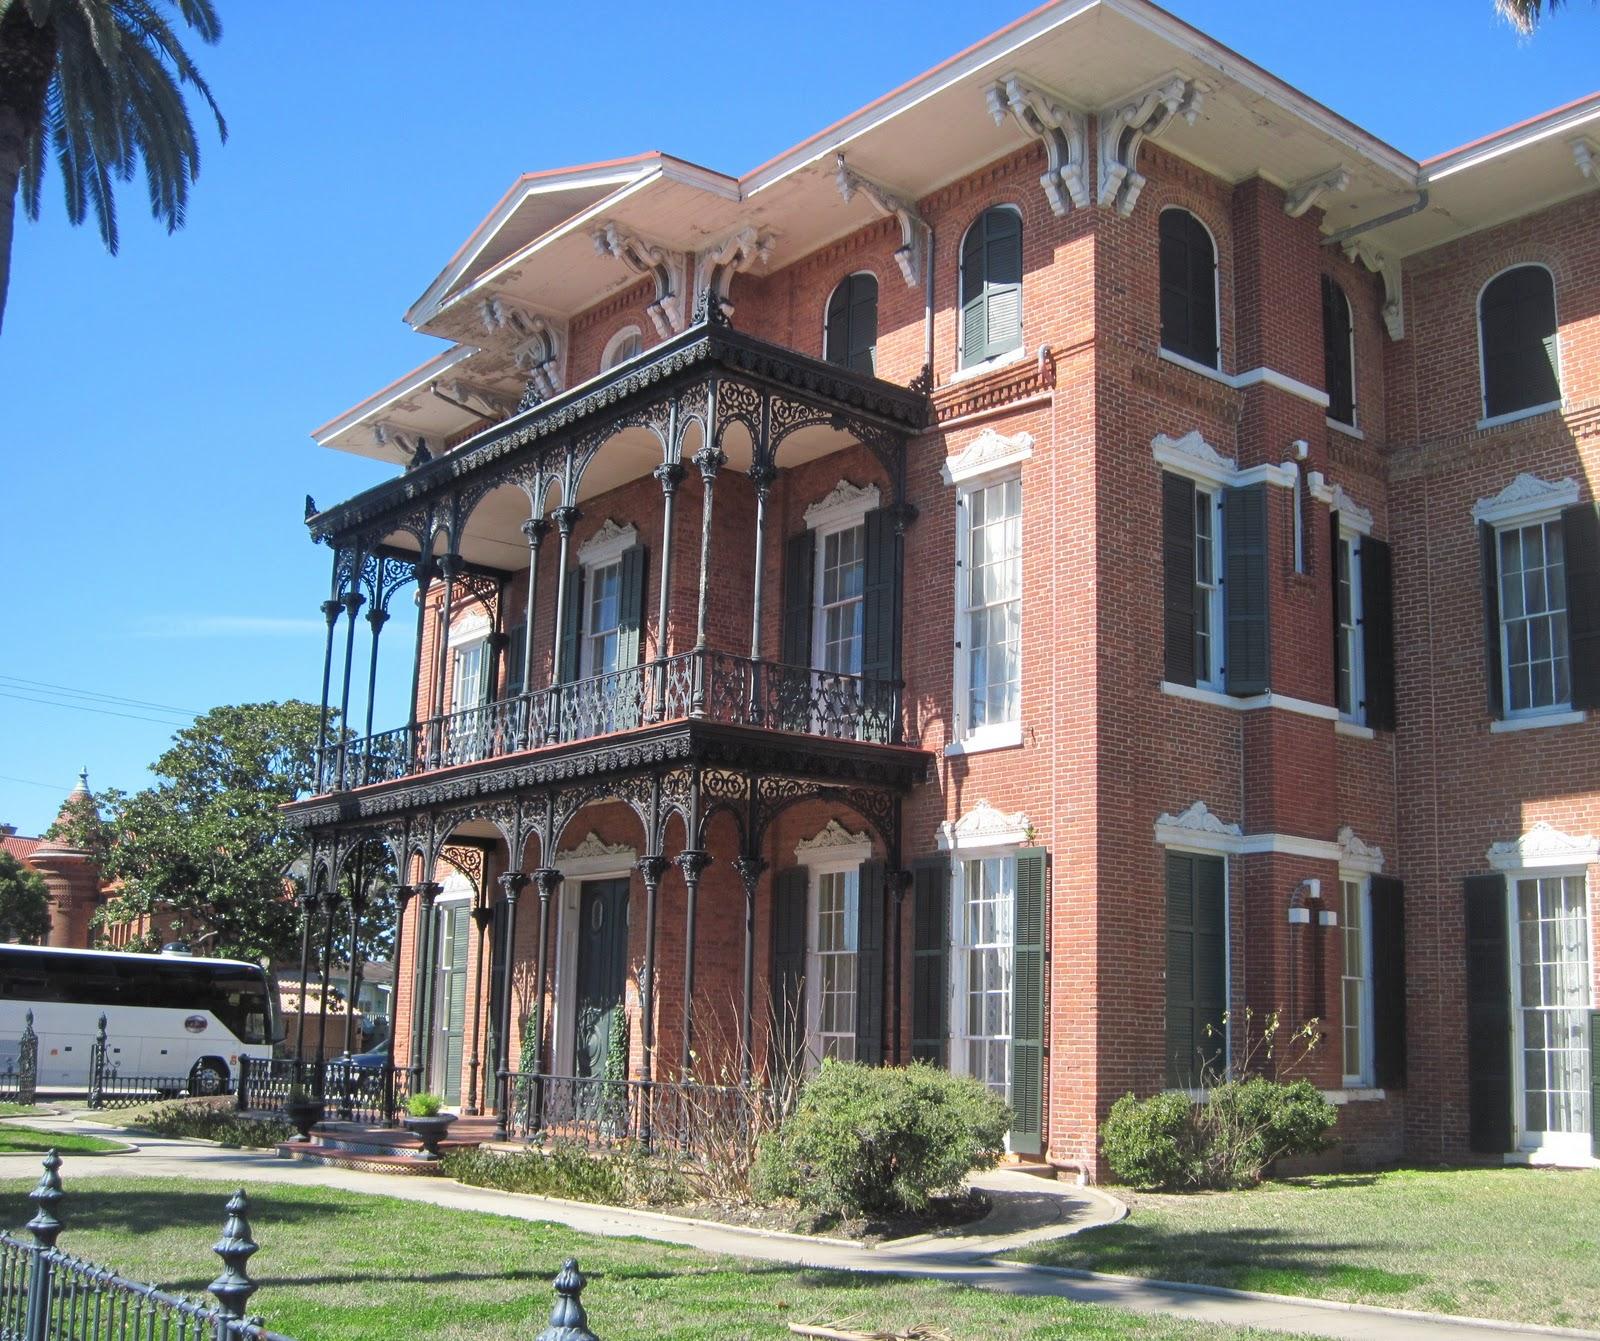 2008 Idea House In Galvestion Texas: The Schramm Journey: Galveston, Texas